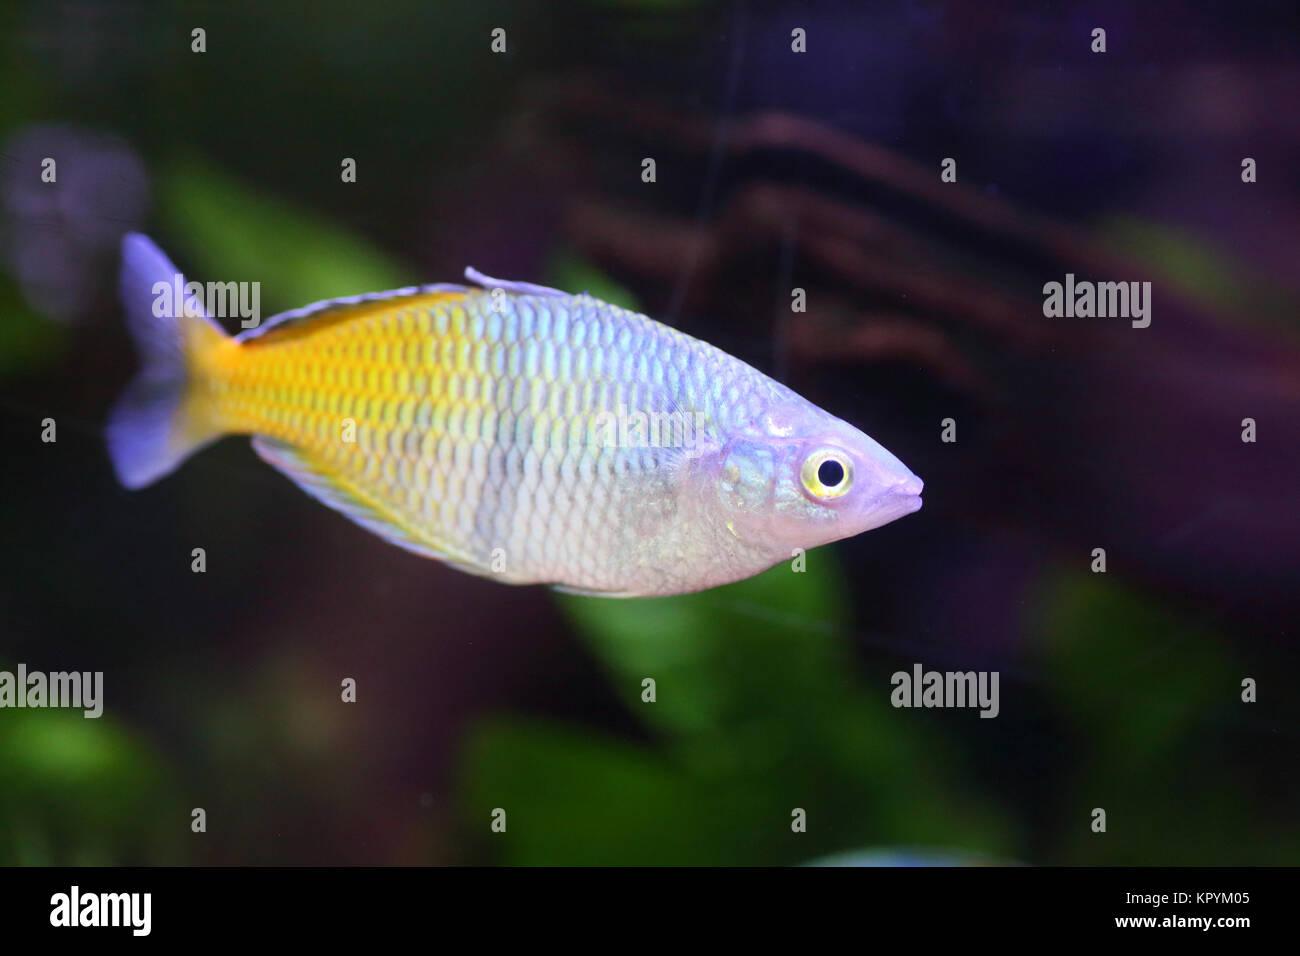 Rainbowfish Stock Photos Rainbowfish Stock Images Alamy